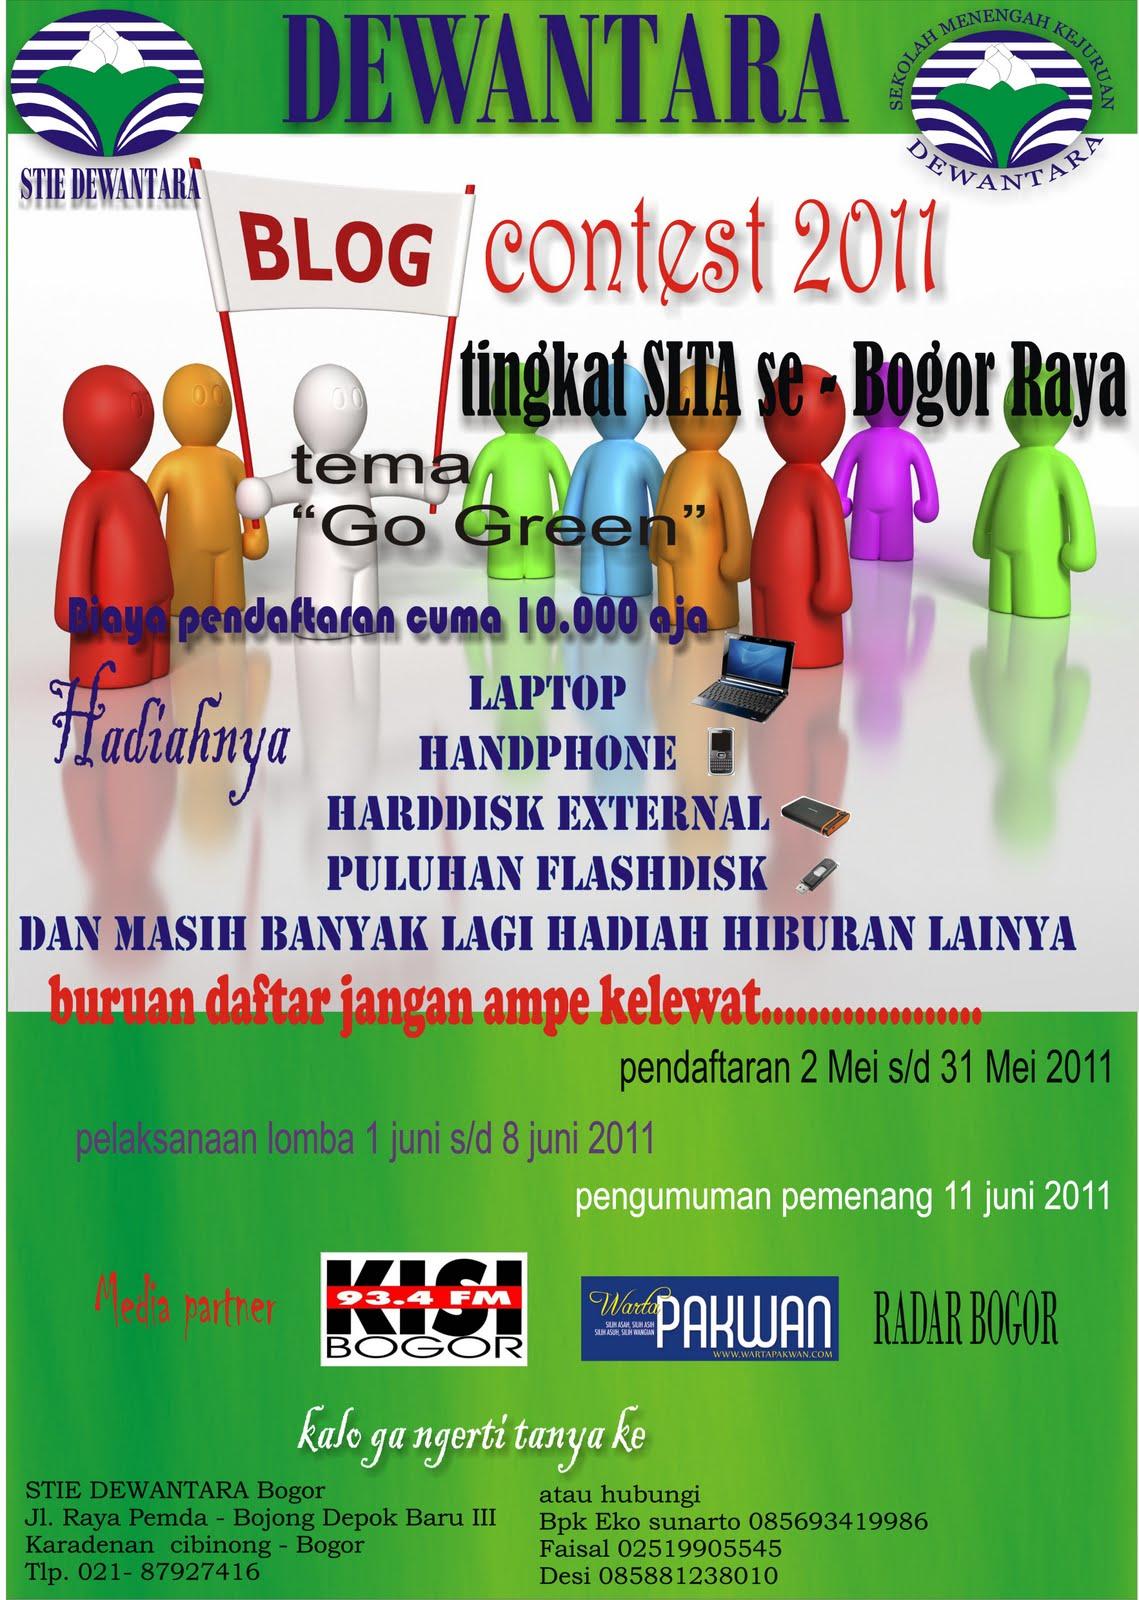 BLOG Contest 2011